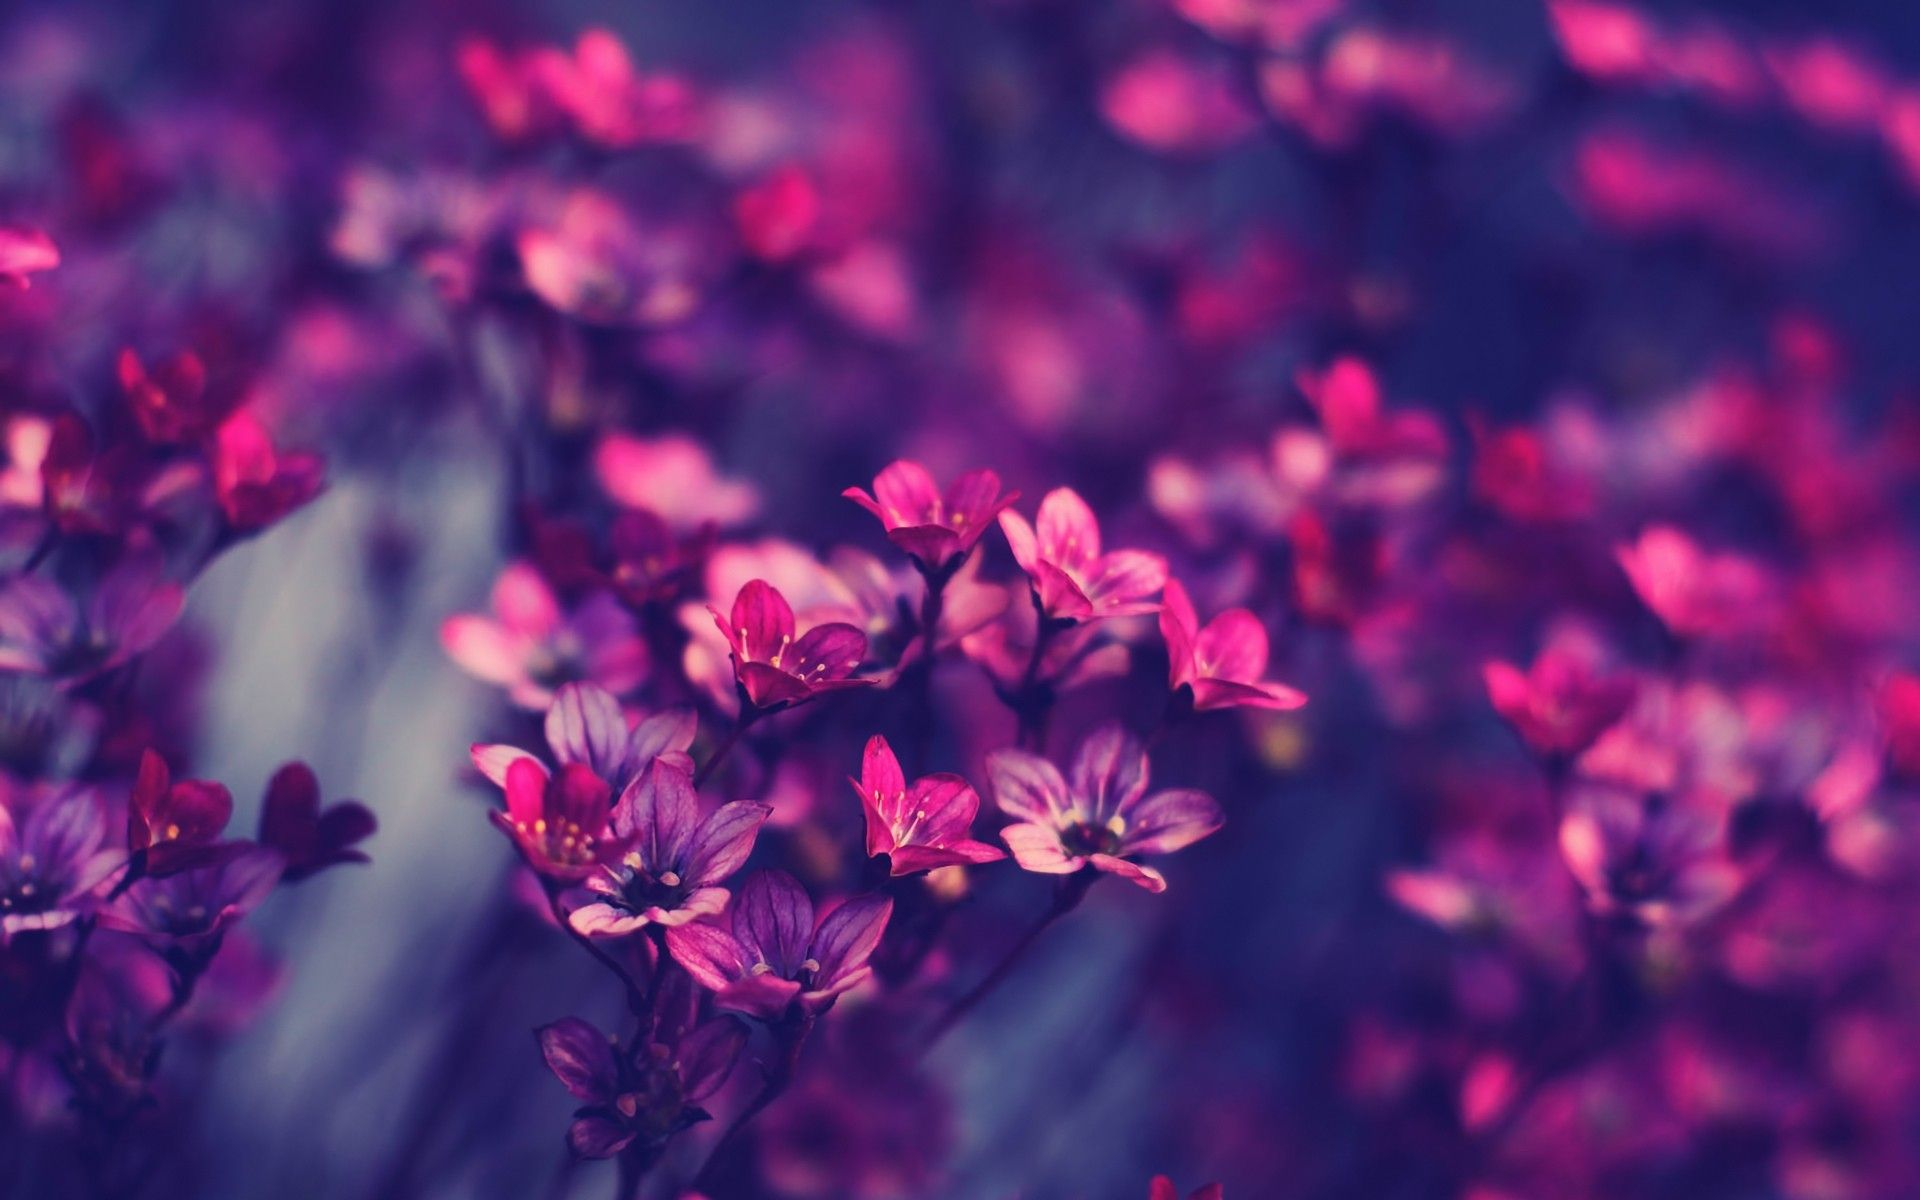 Tumblr Spring Wallpaper Purple Flowers Wallpaper Most Beautiful Flowers Flowers Nature